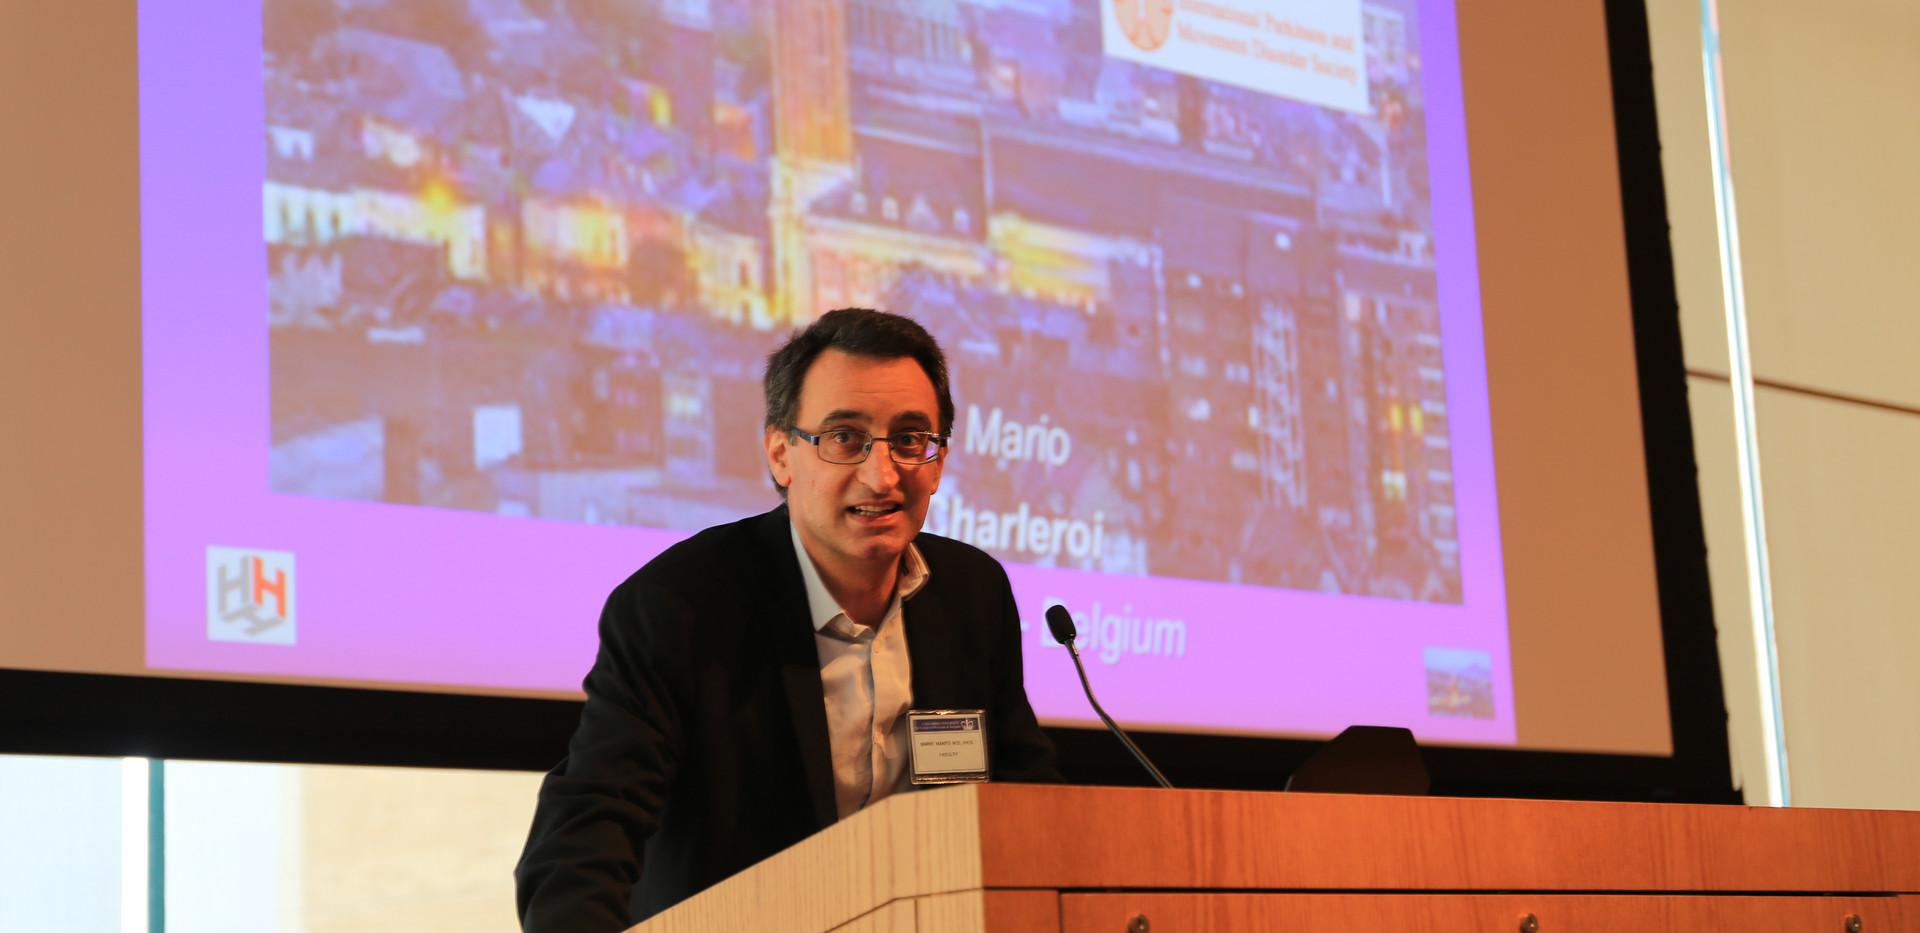 Speaker_Mario Manto.JPG